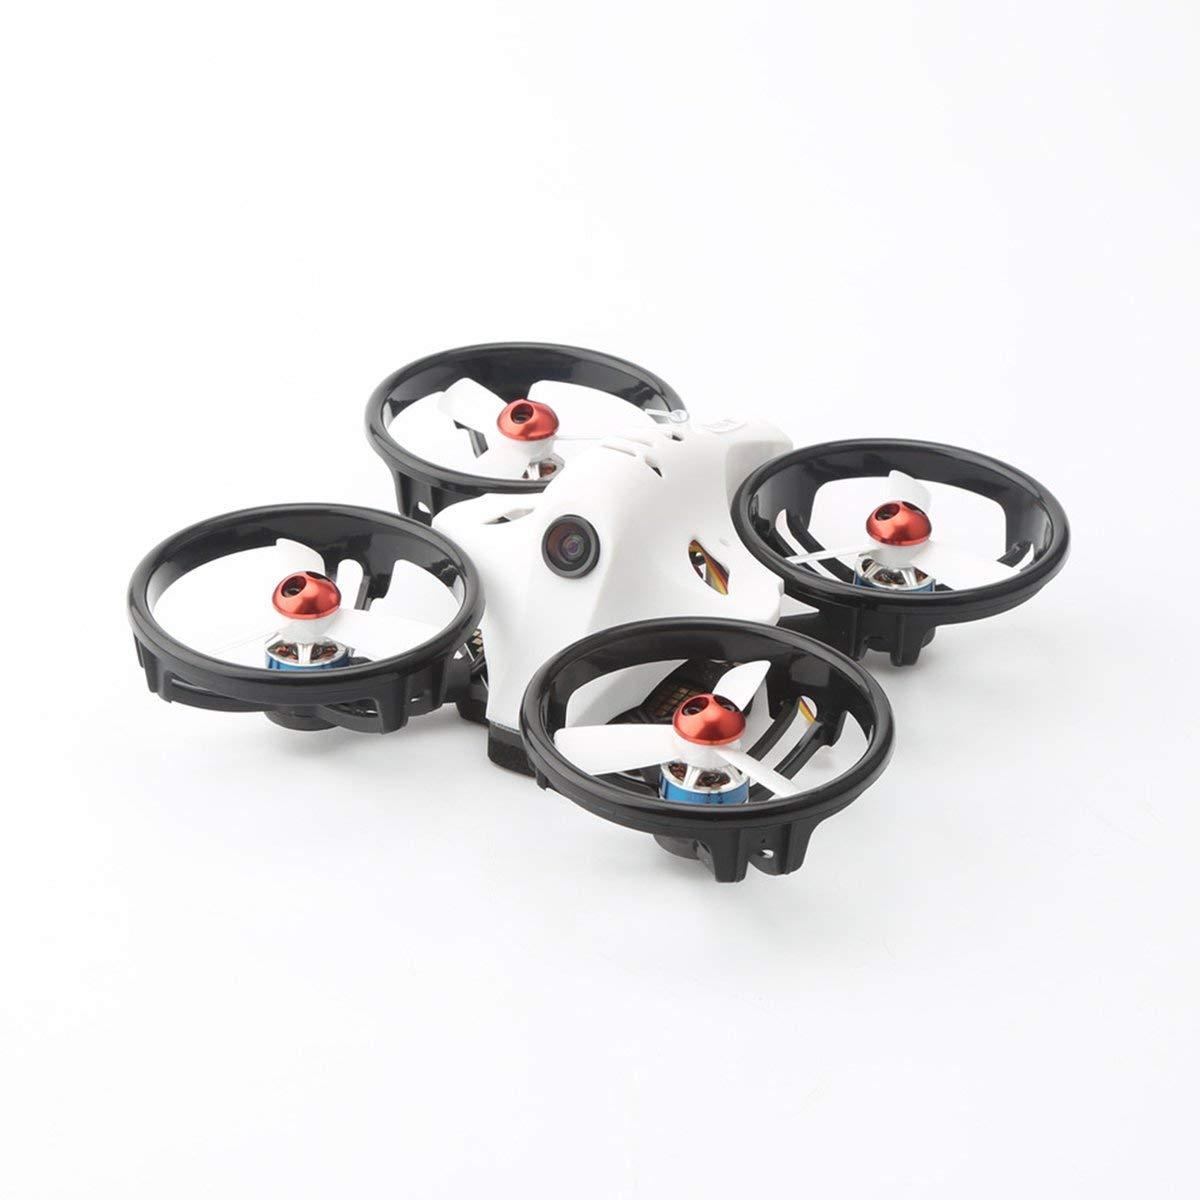 Gugutogo Drohne Mit Kamera LDARC ET100 5.8G Brushless DSM2 Empfänger OSD Cam FPV Mini RC Racing Drohne PNP